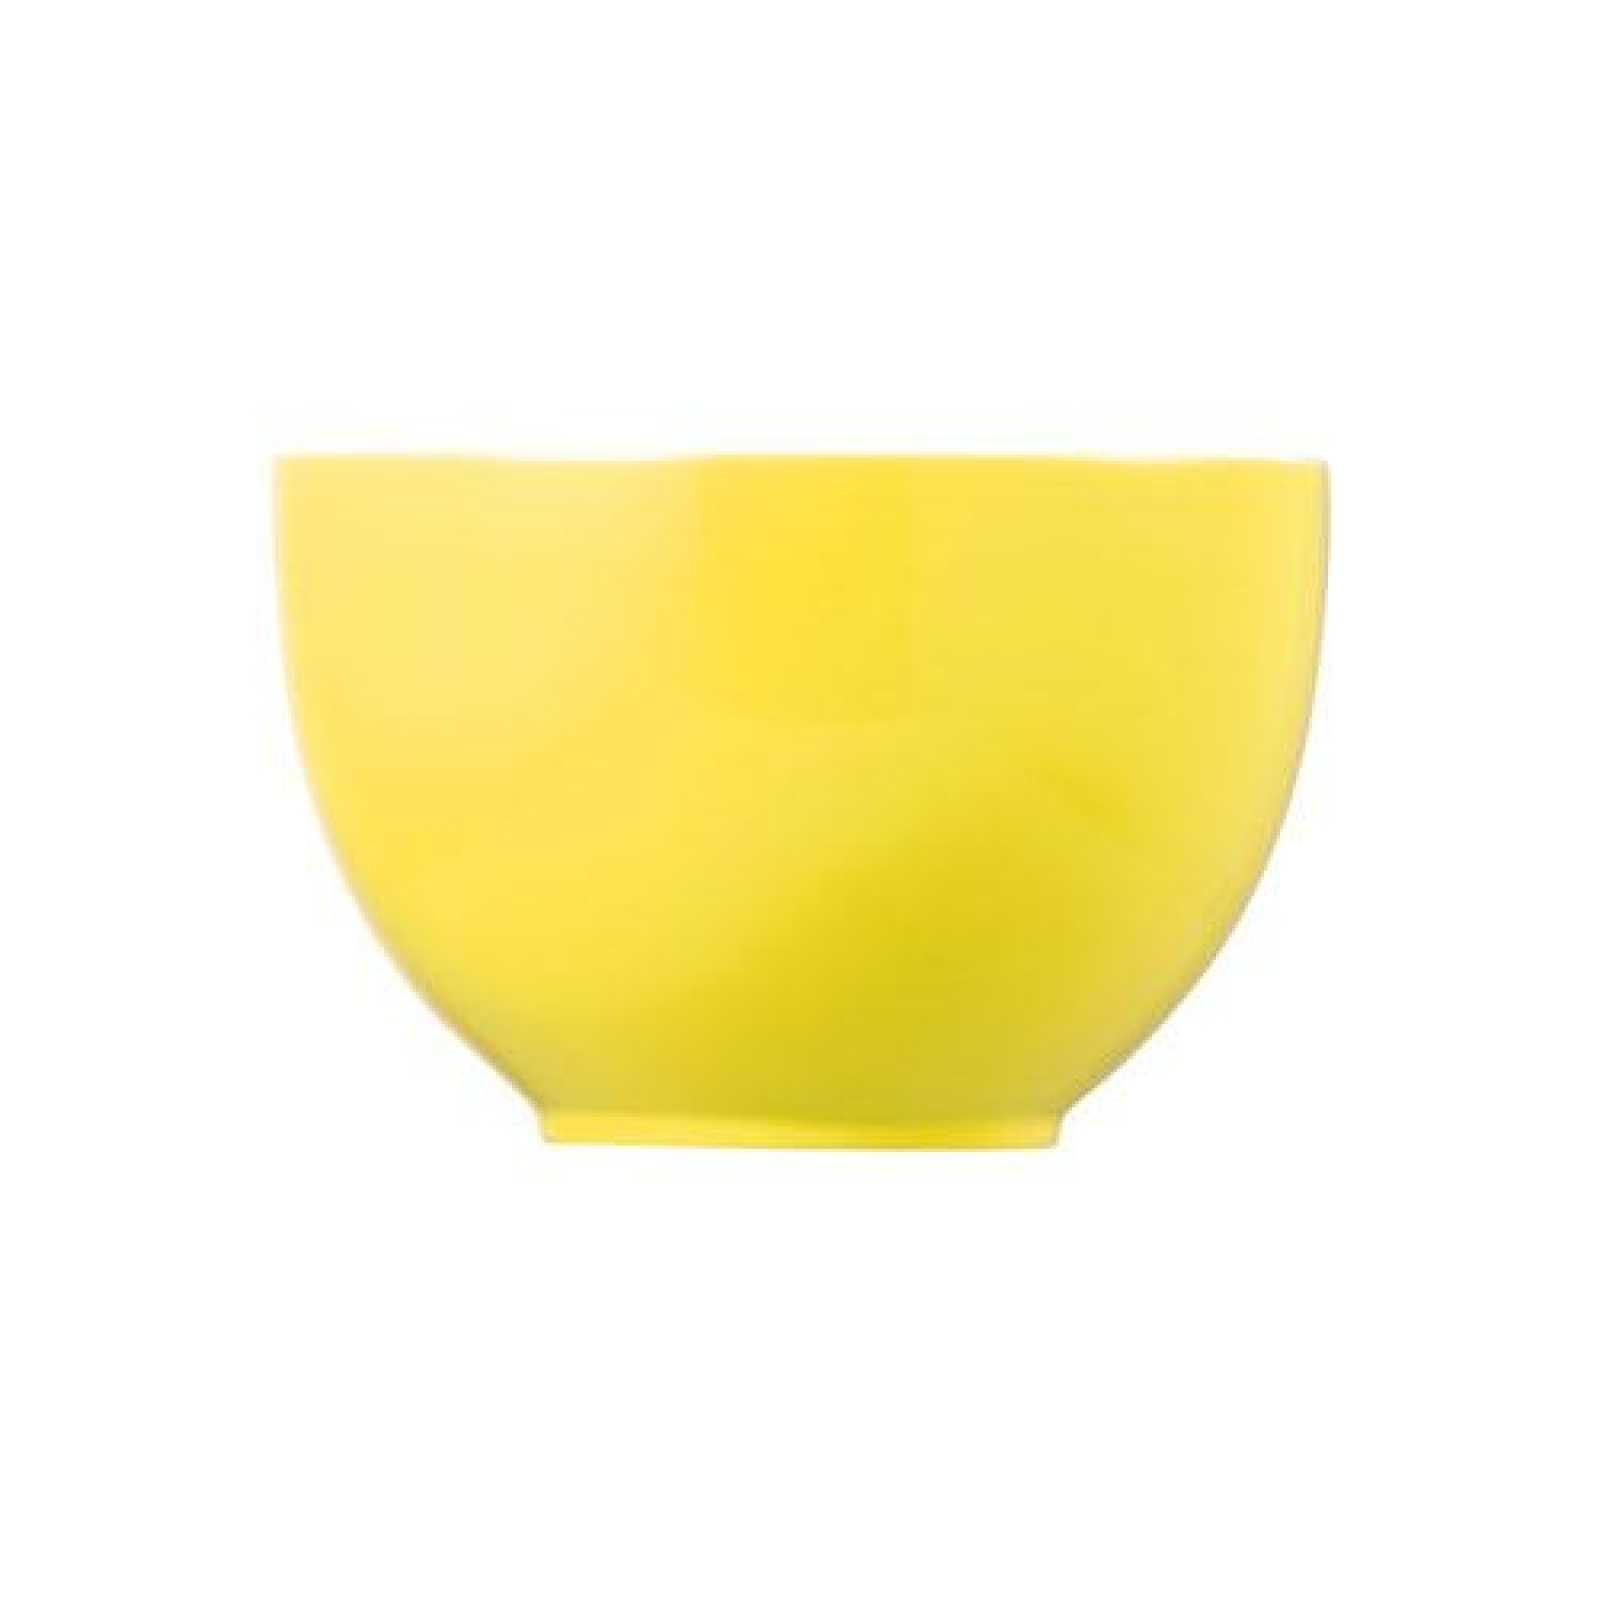 Онлайн каталог PROMENU: Пиала фарфоровая Rosenthal SUNNY DAY, диаметр 12 см, желтый Rosenthal 10850-408502-15456